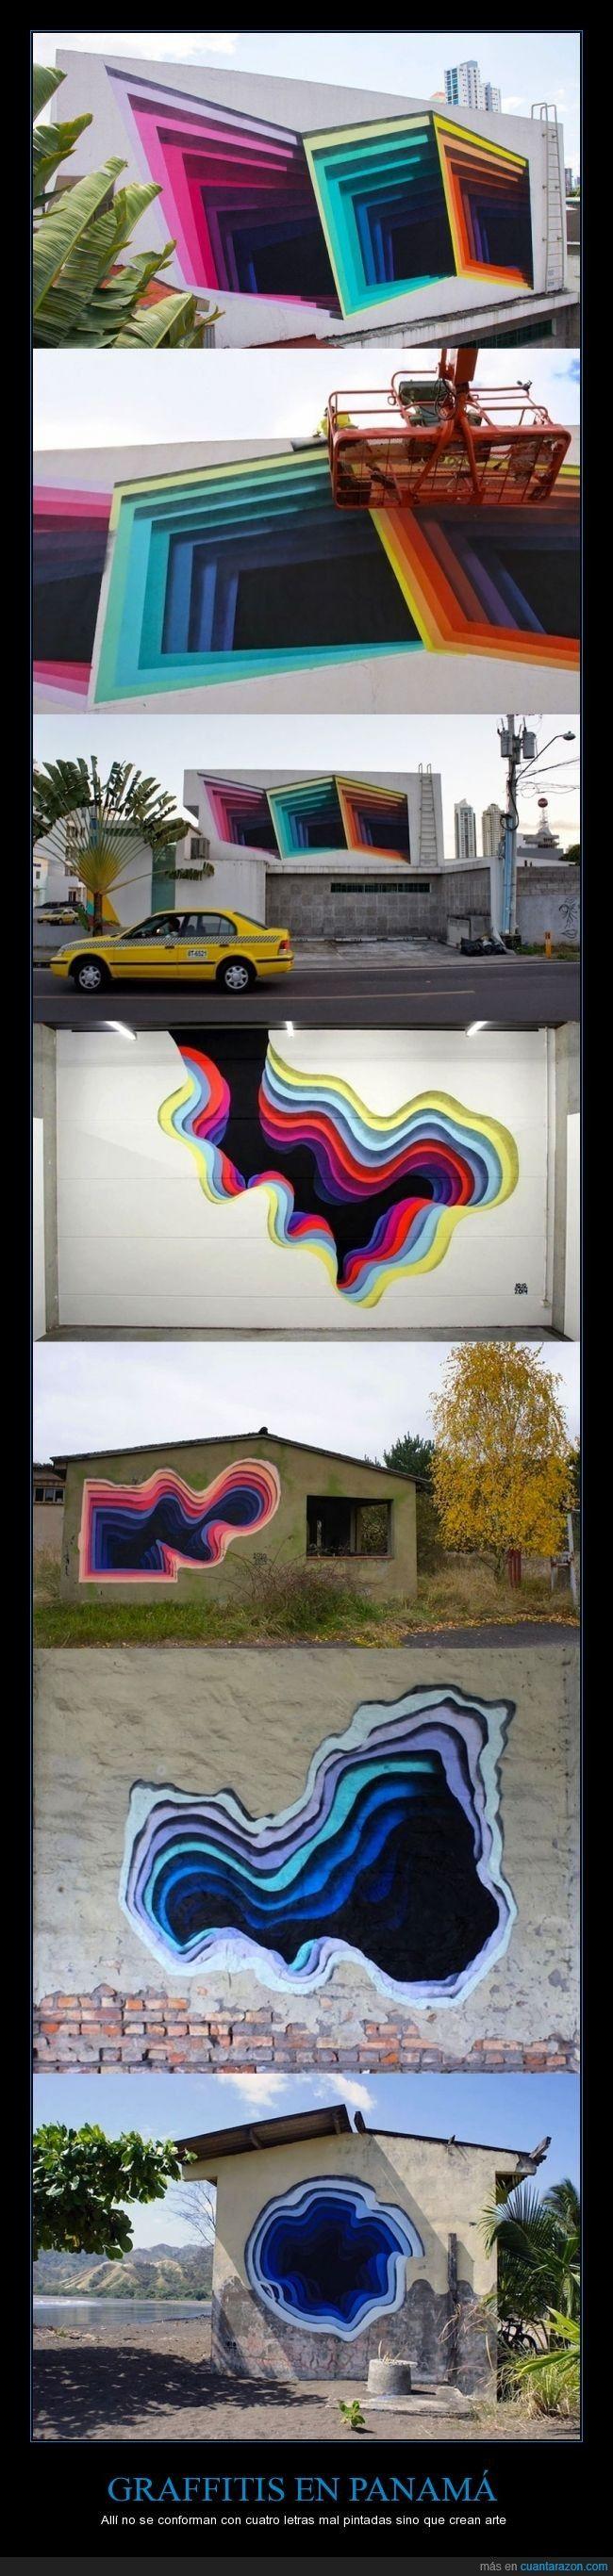 graffitis en panam all no se conforman con cuatro letras mal pintadas sino que crean